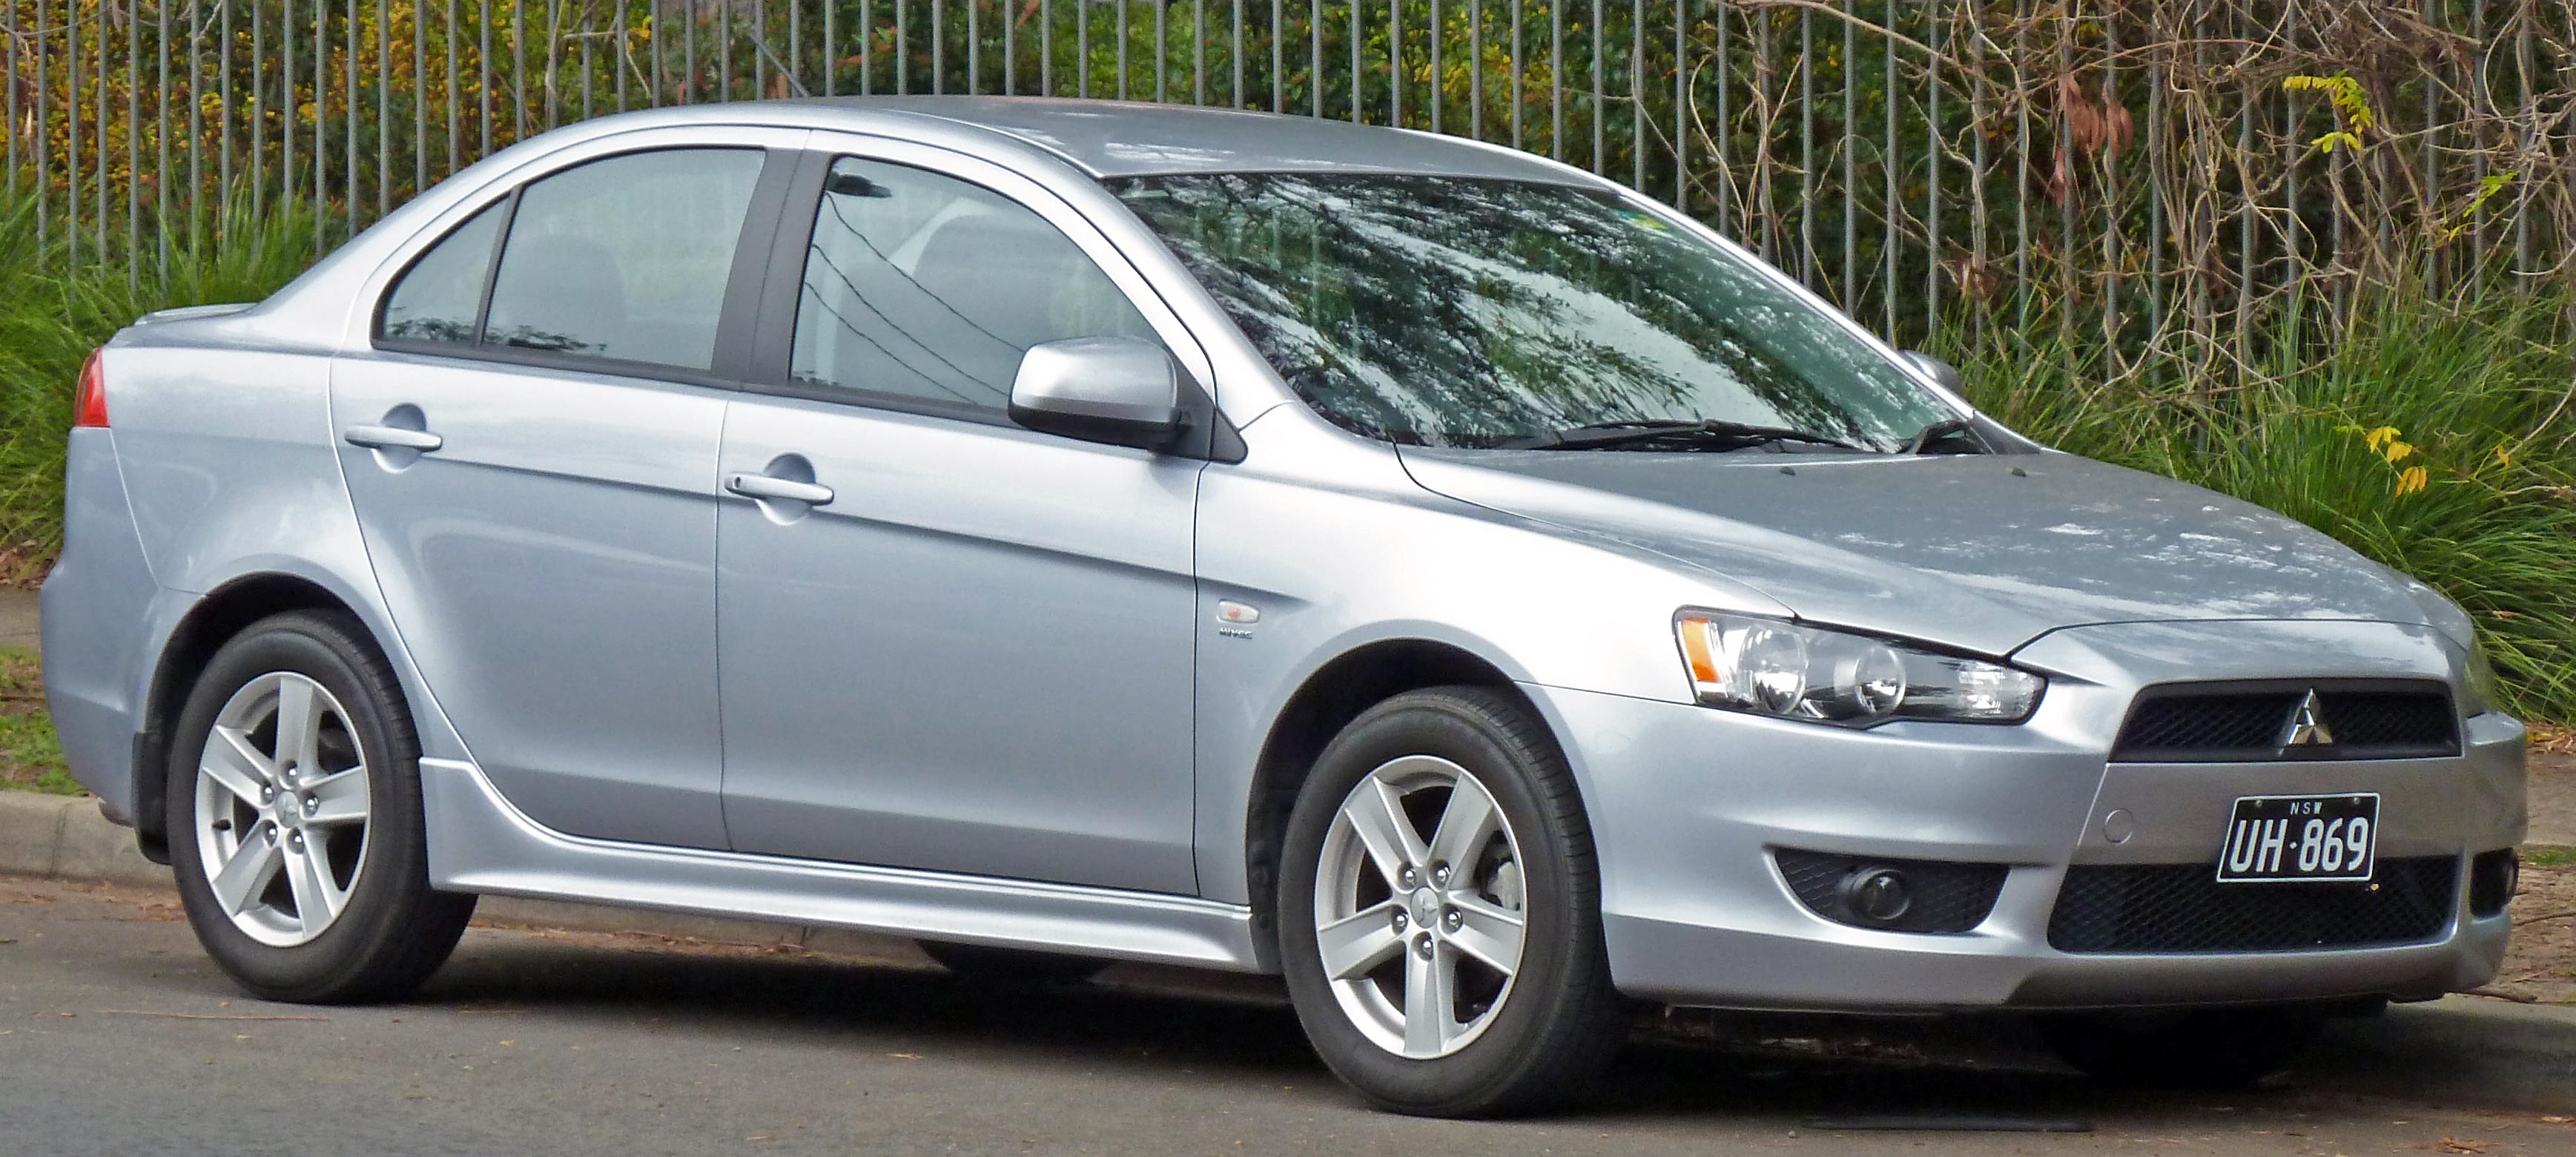 Mitsubishi Lancer - Wikipedia